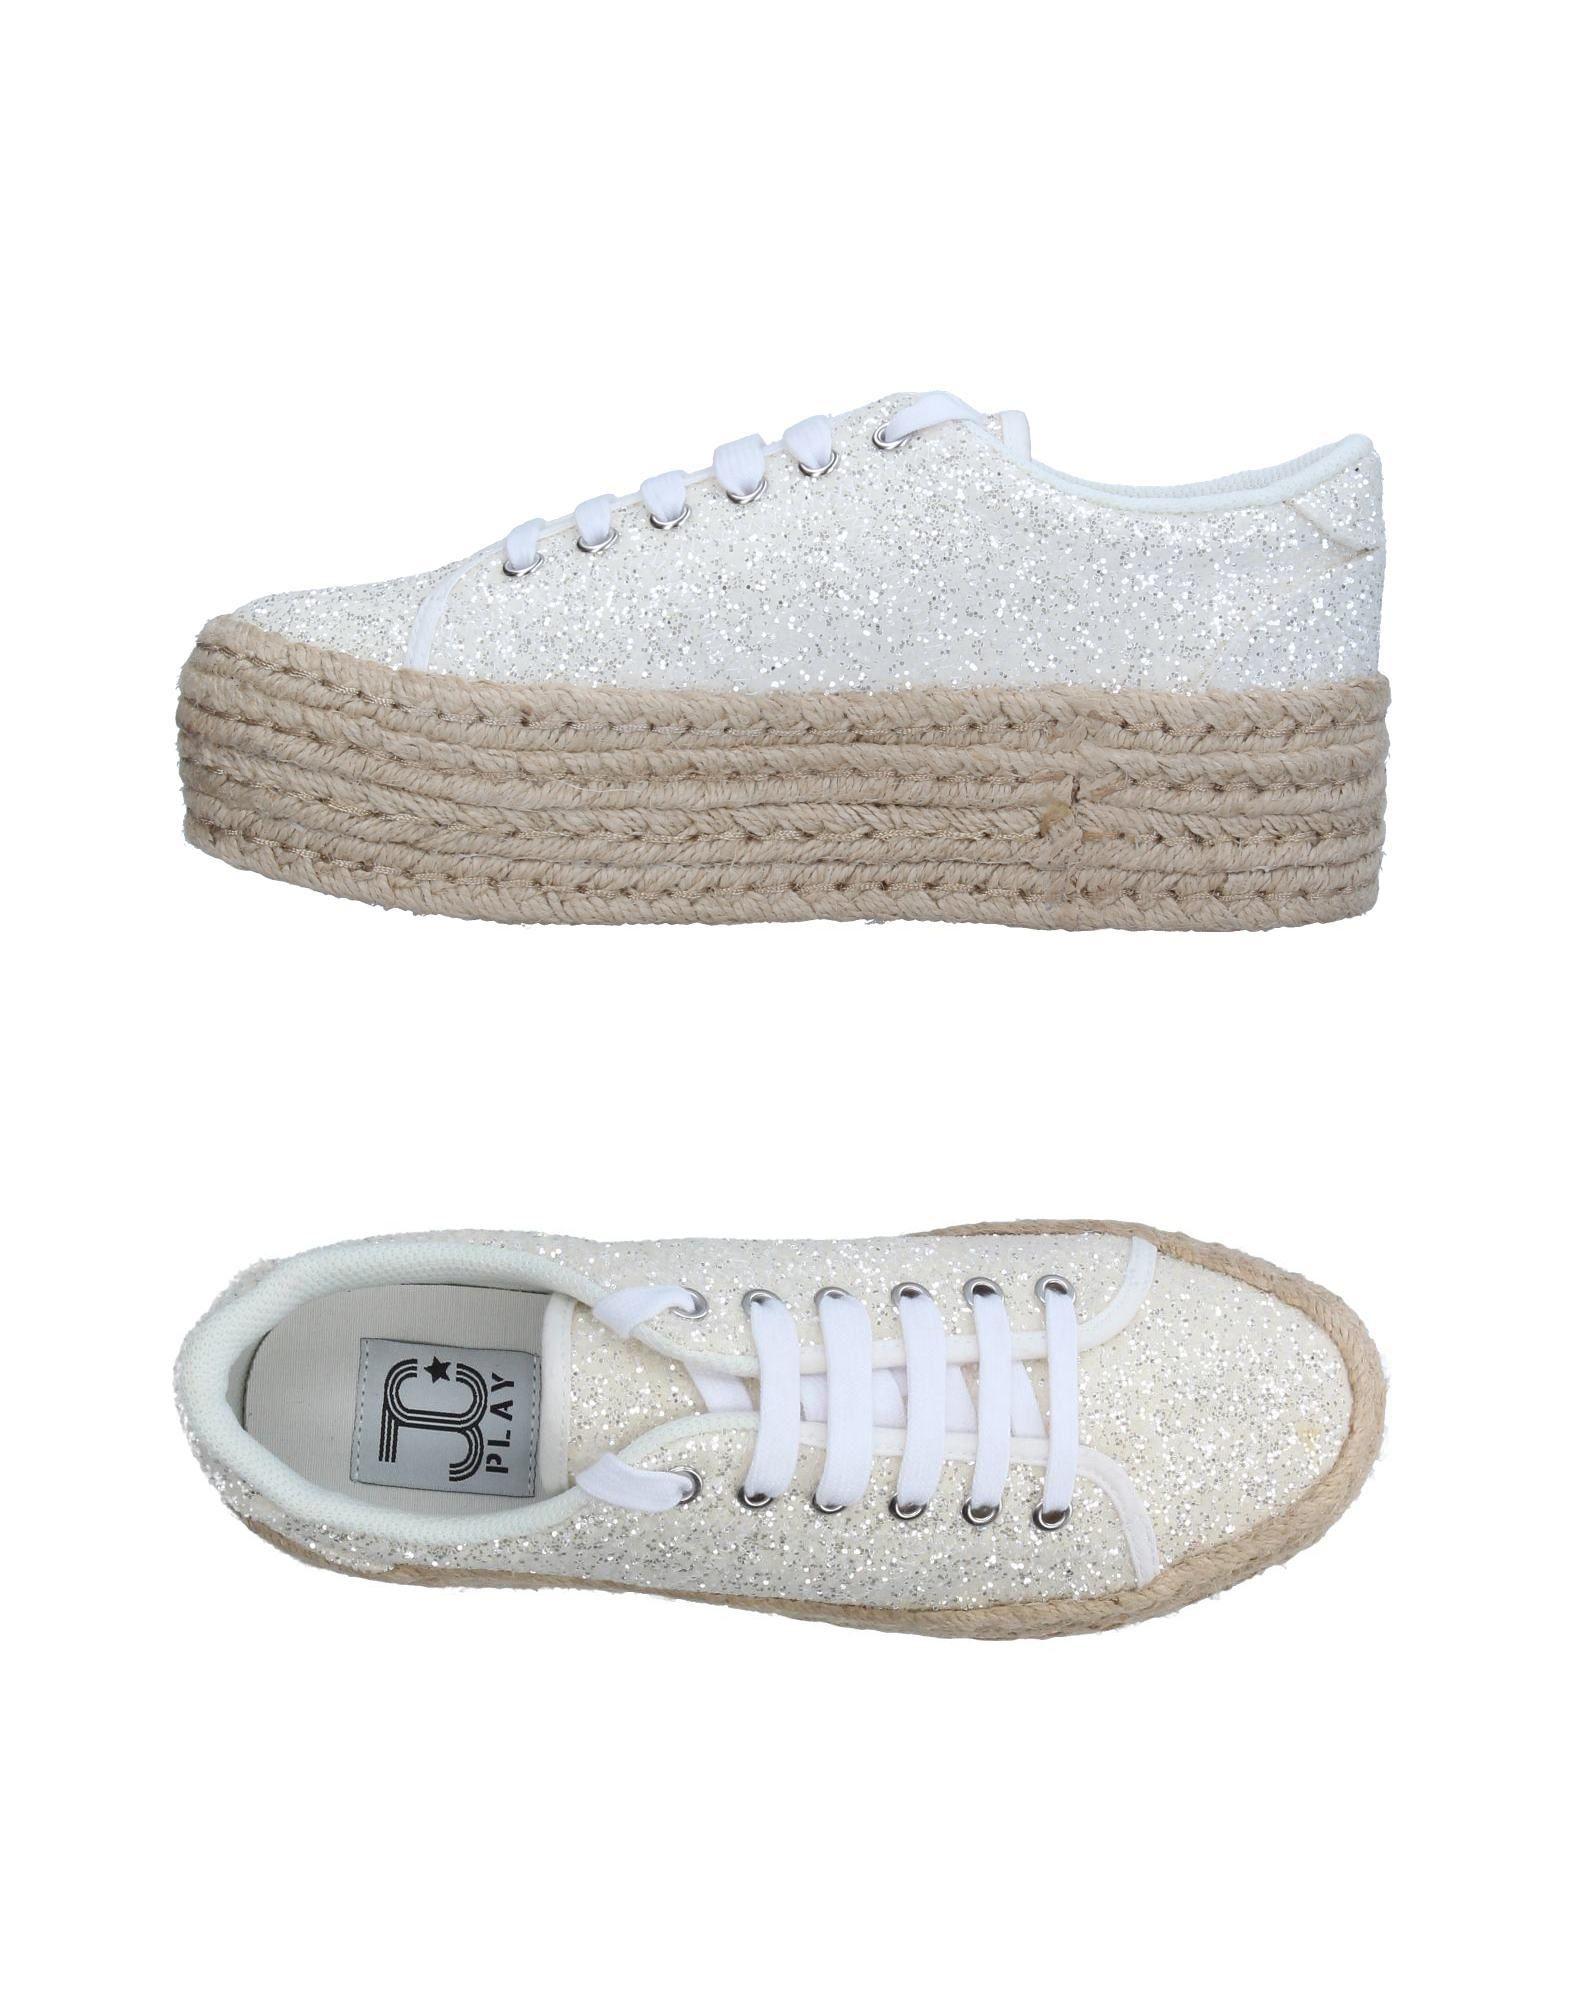 Jc Play By Jeffrey Campbell Sneakers Damen  11329033HX